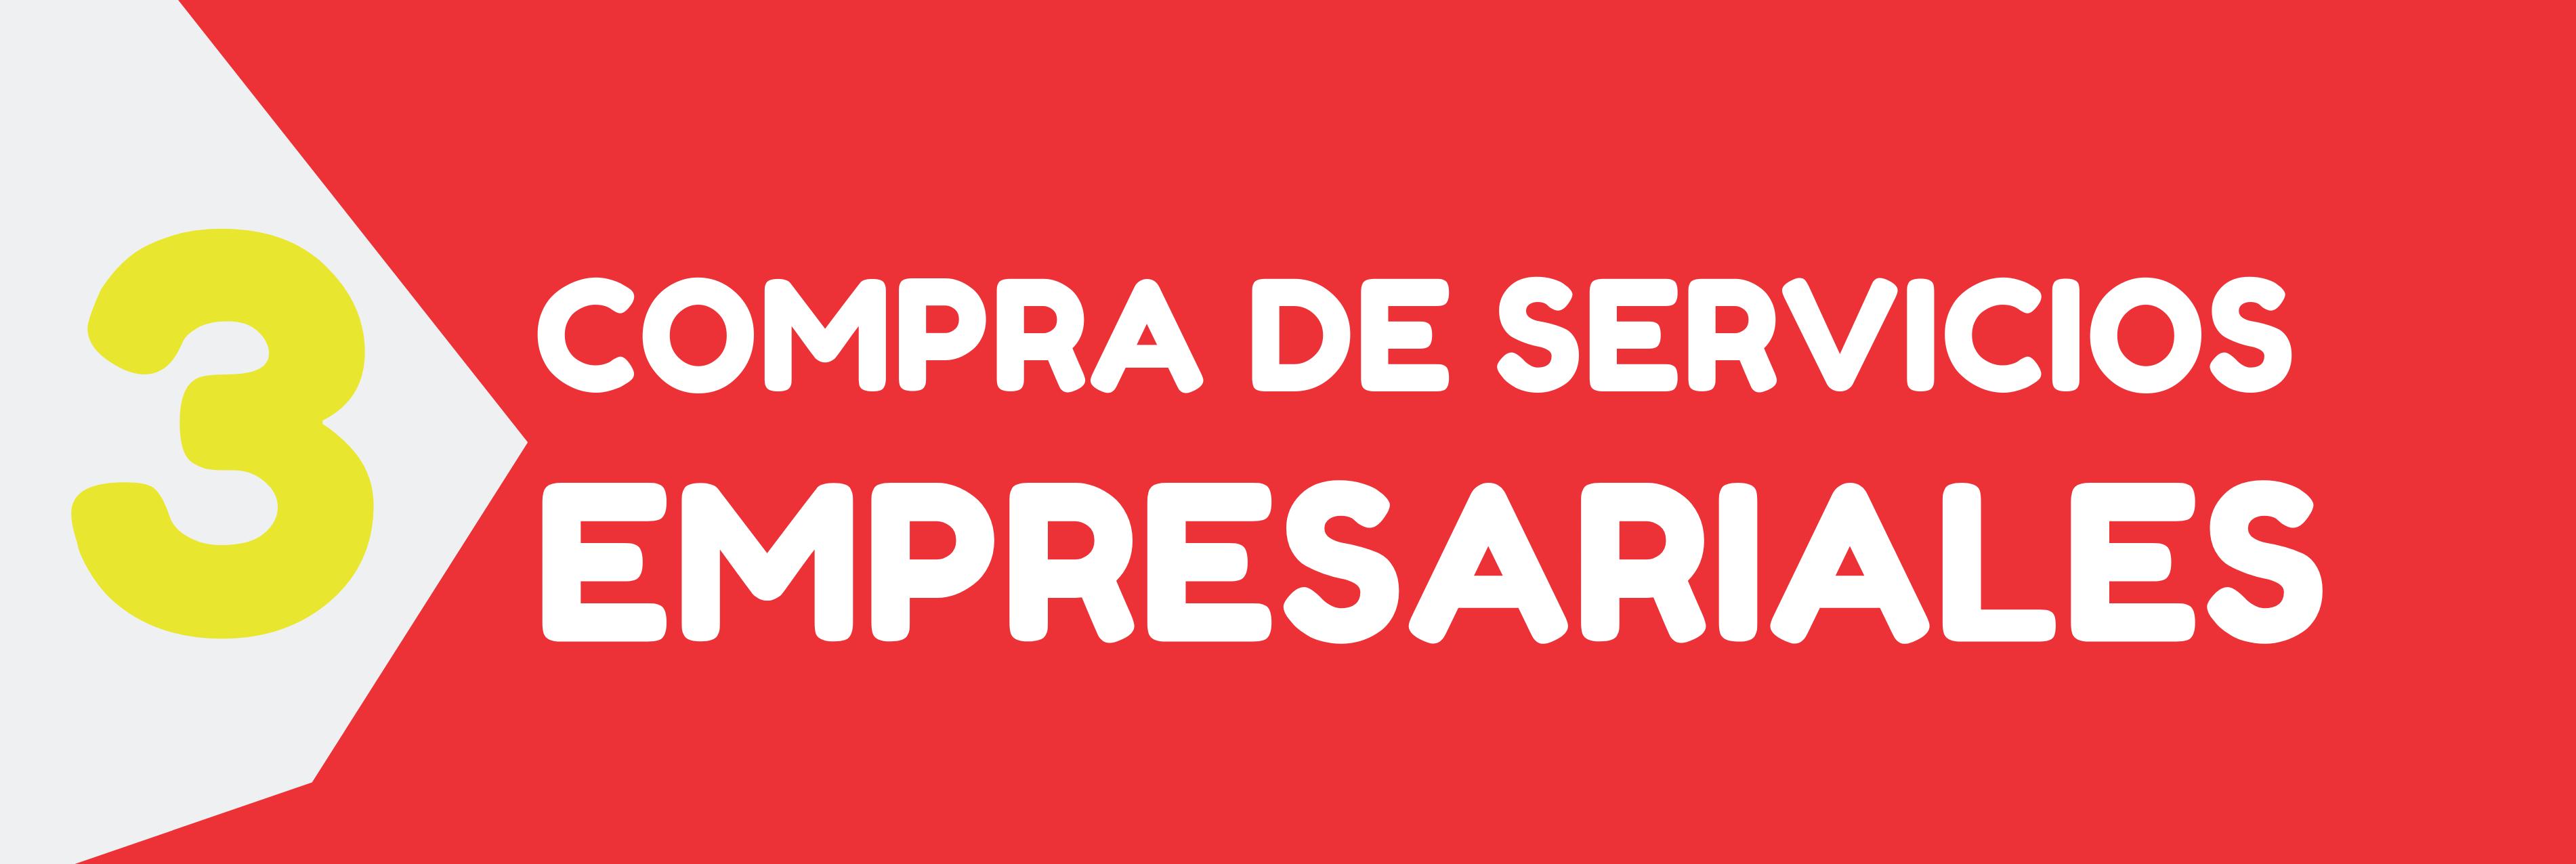 http://ccmagangue.org.co/media/imagenes/serviciosvirtuales/compradeserviciosempresariales